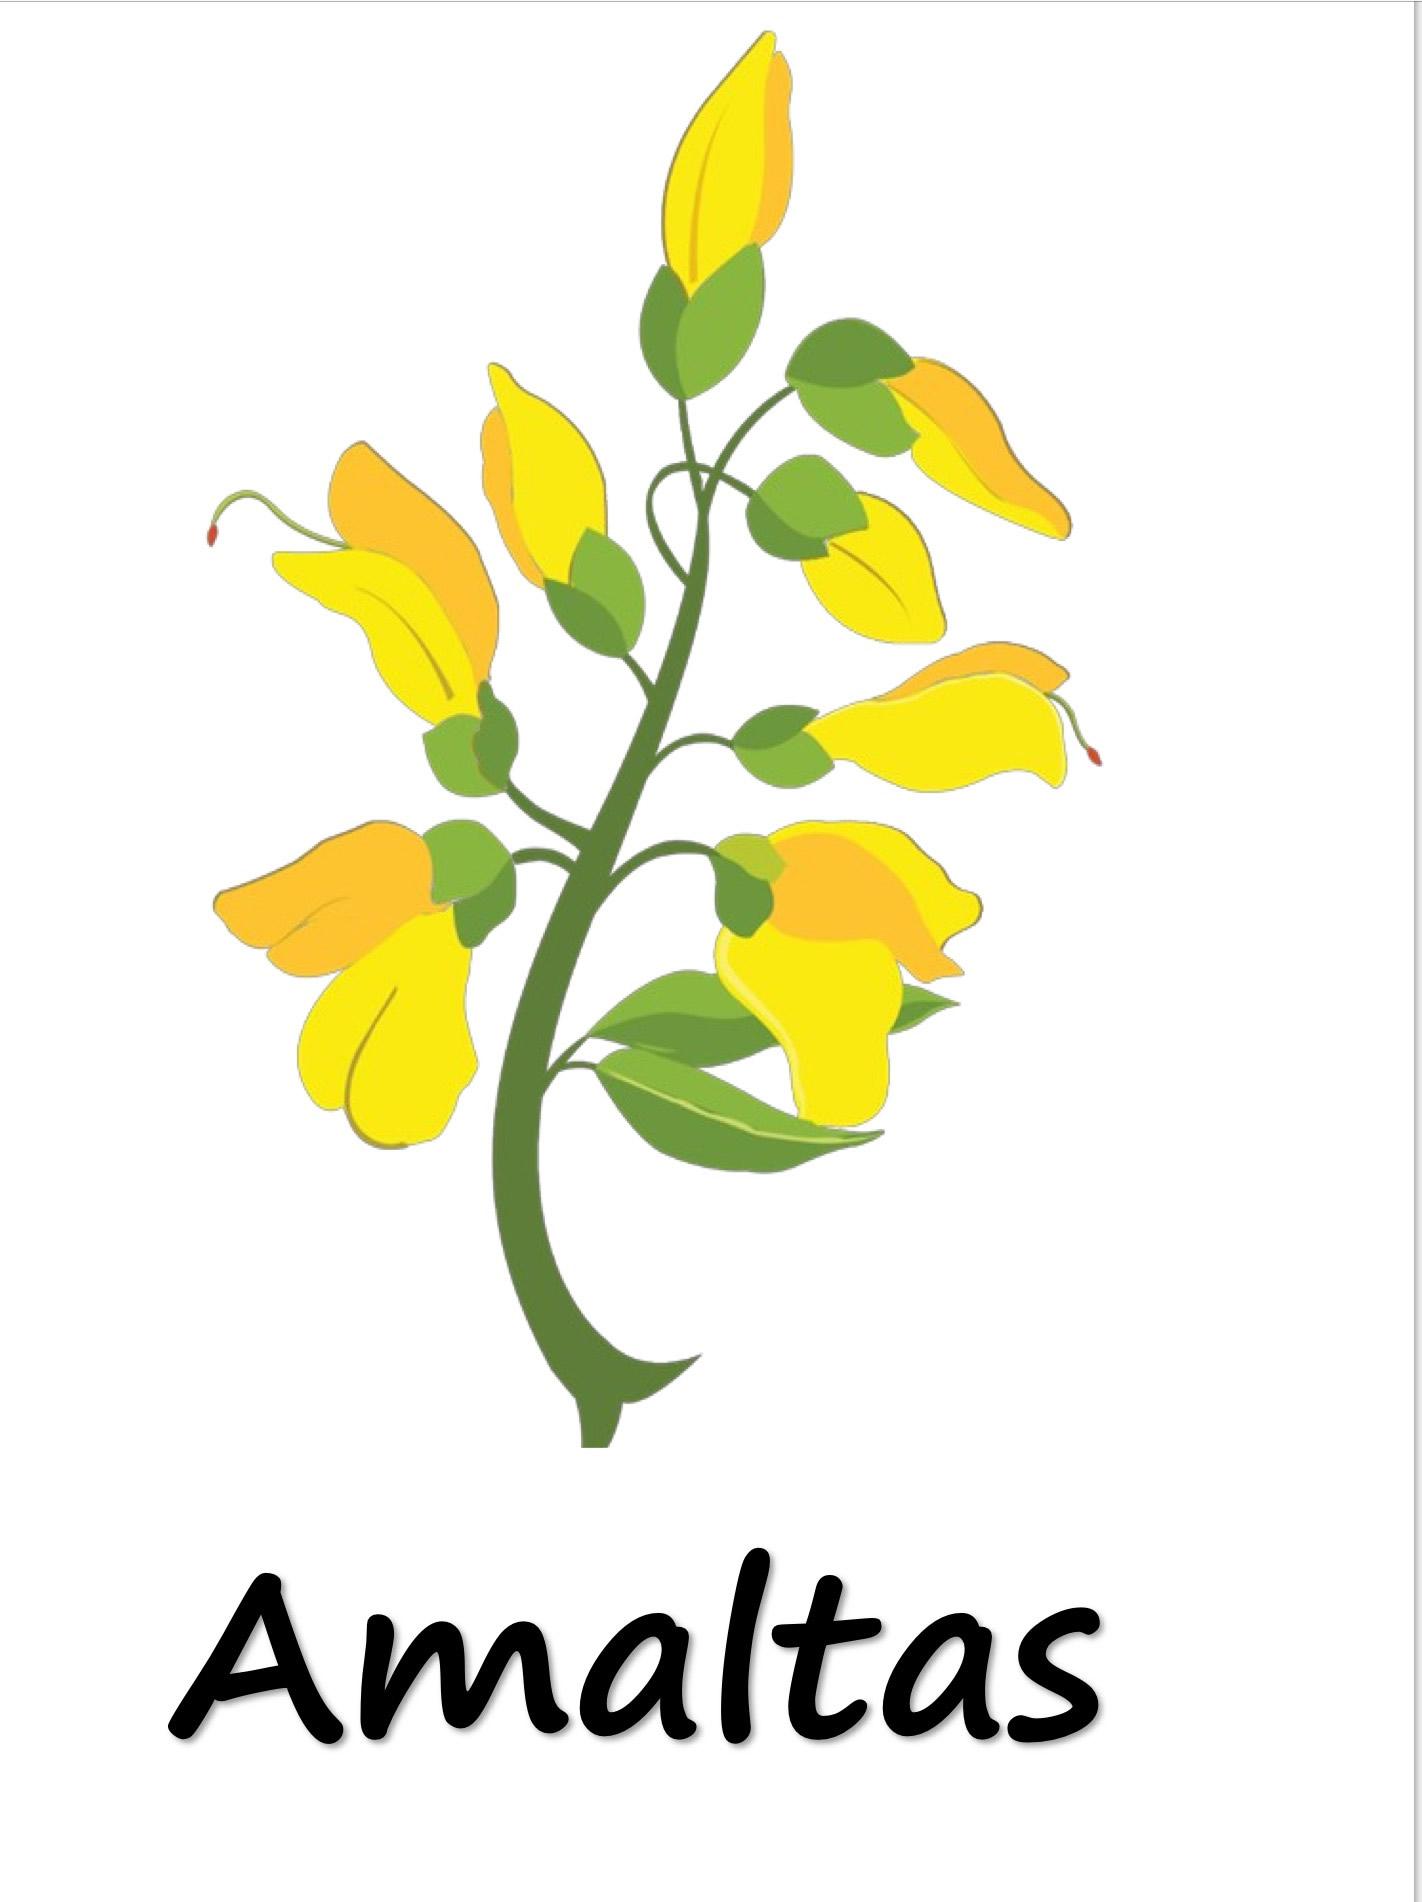 Amaltas clipart #9, Download drawings